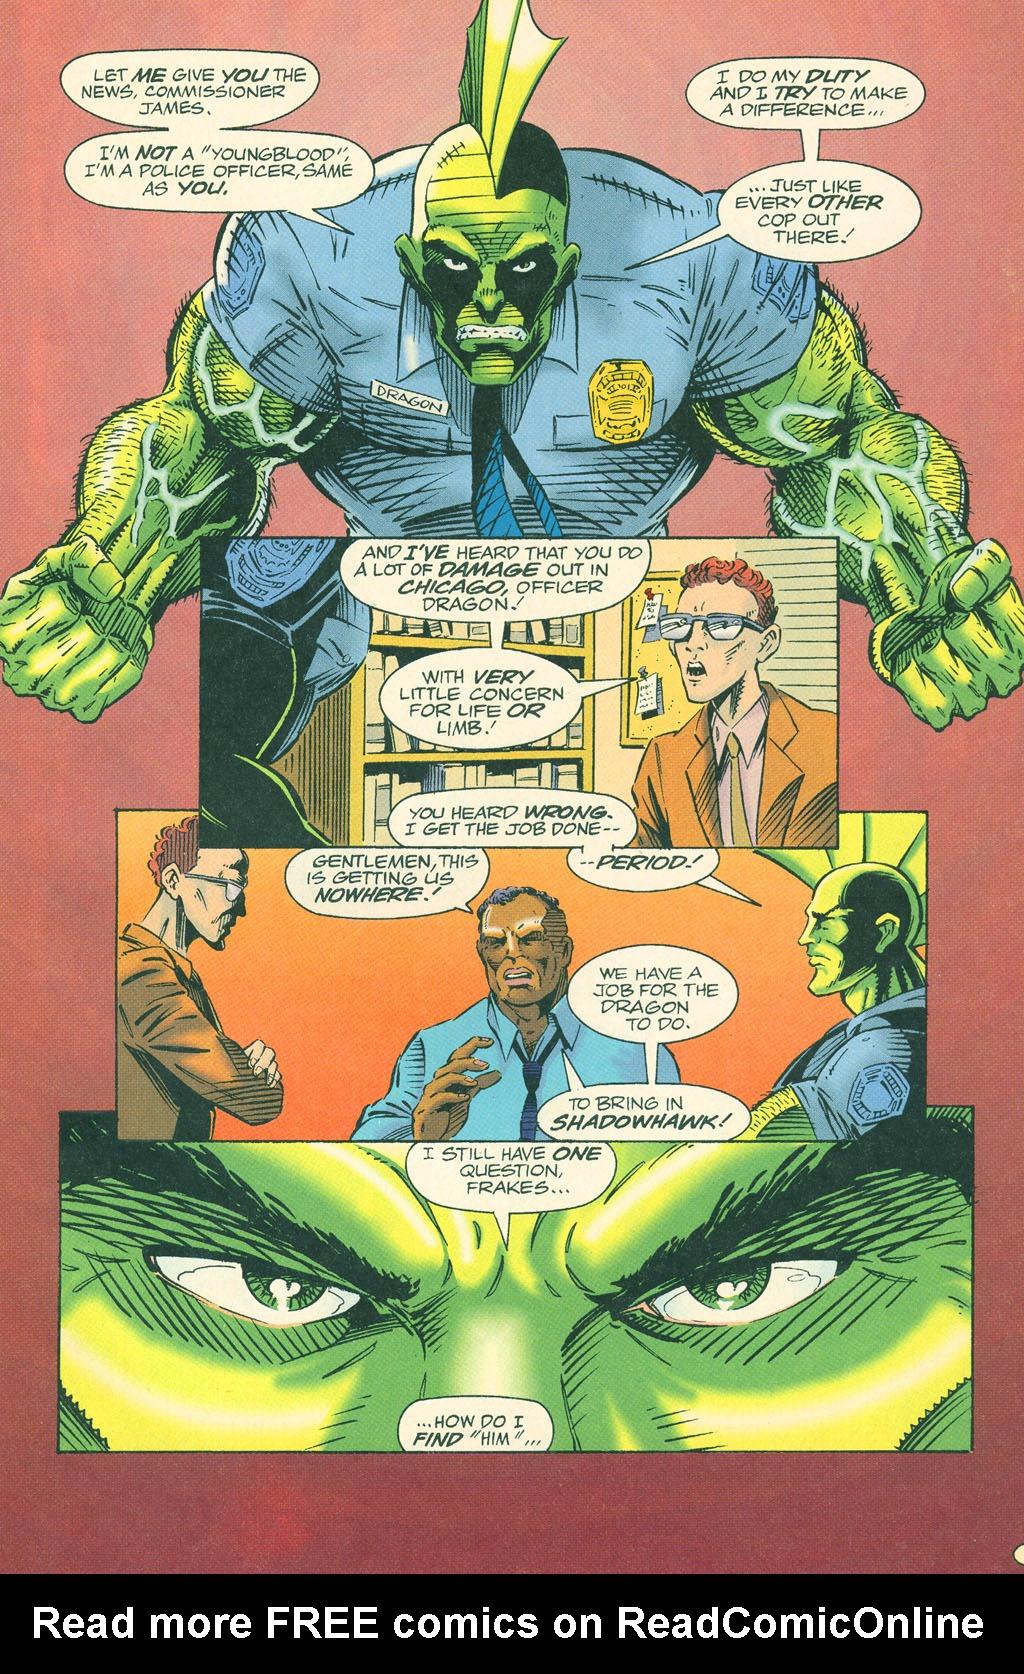 Read online ShadowHawk comic -  Issue #4 - 6